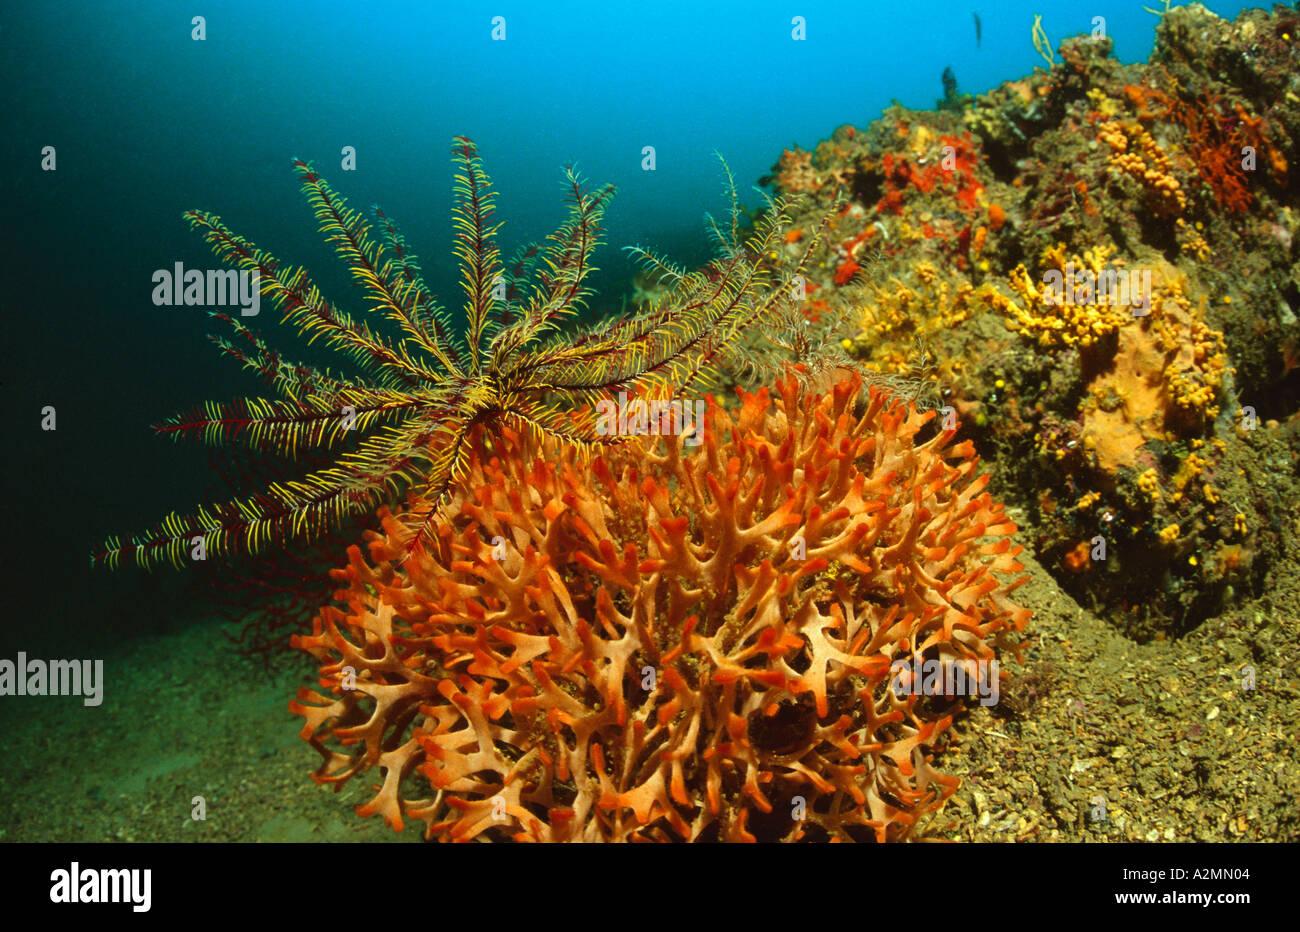 reef with orange bryozoans and featherstar, Pentapora fascialis Stock Photo